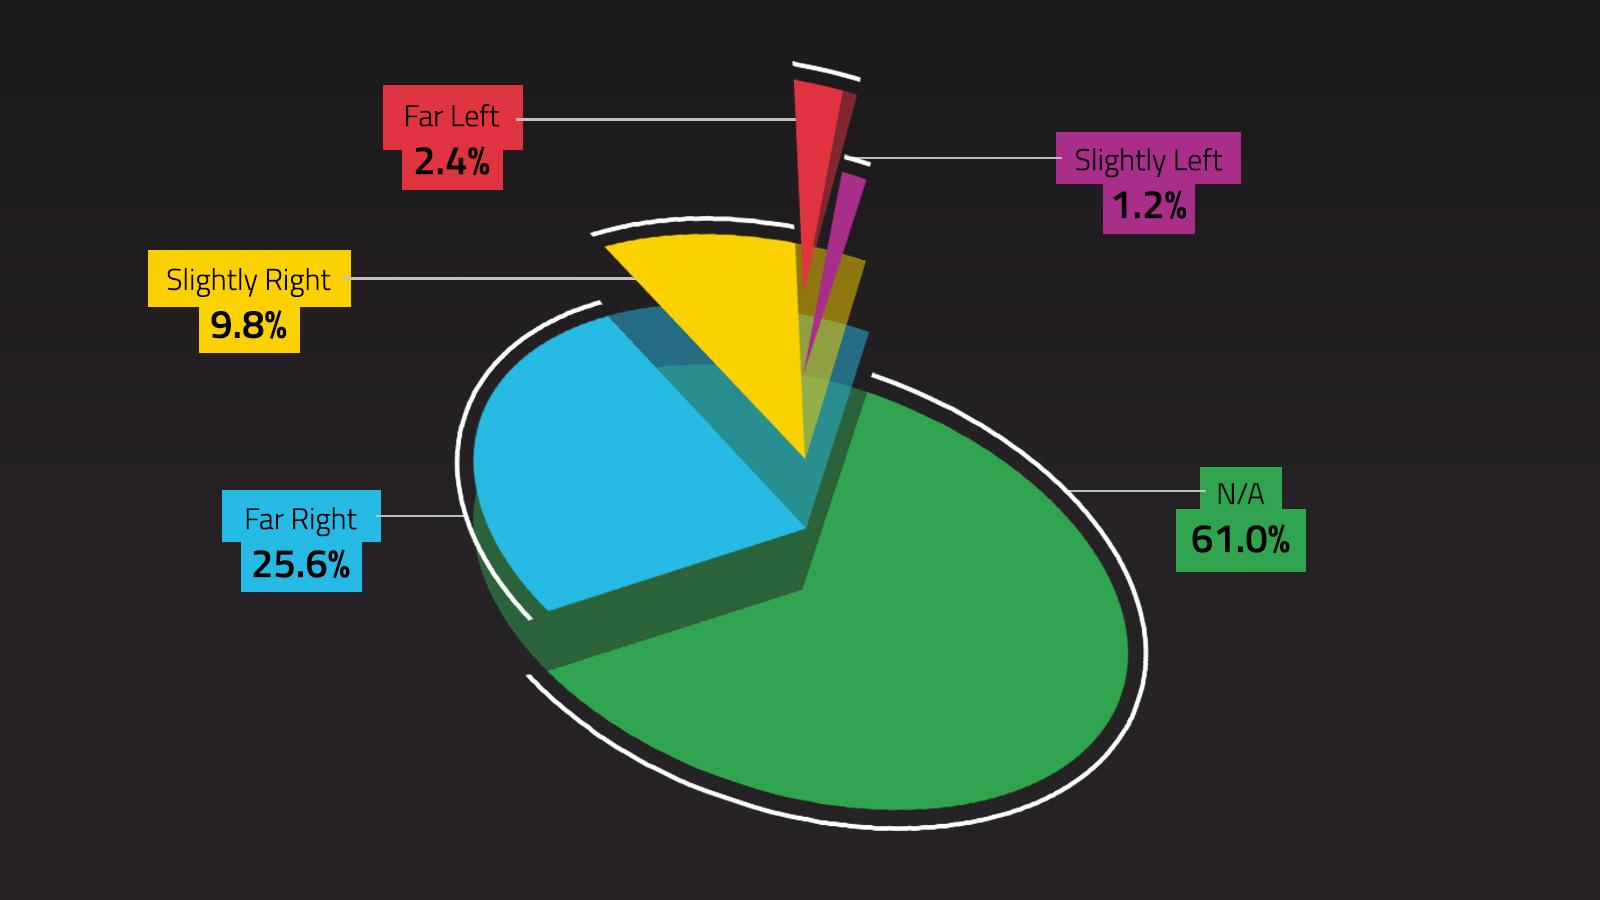 https://avaazimages.avaaz.org/health_report_pie_chart_orientation_desk_na.jpg